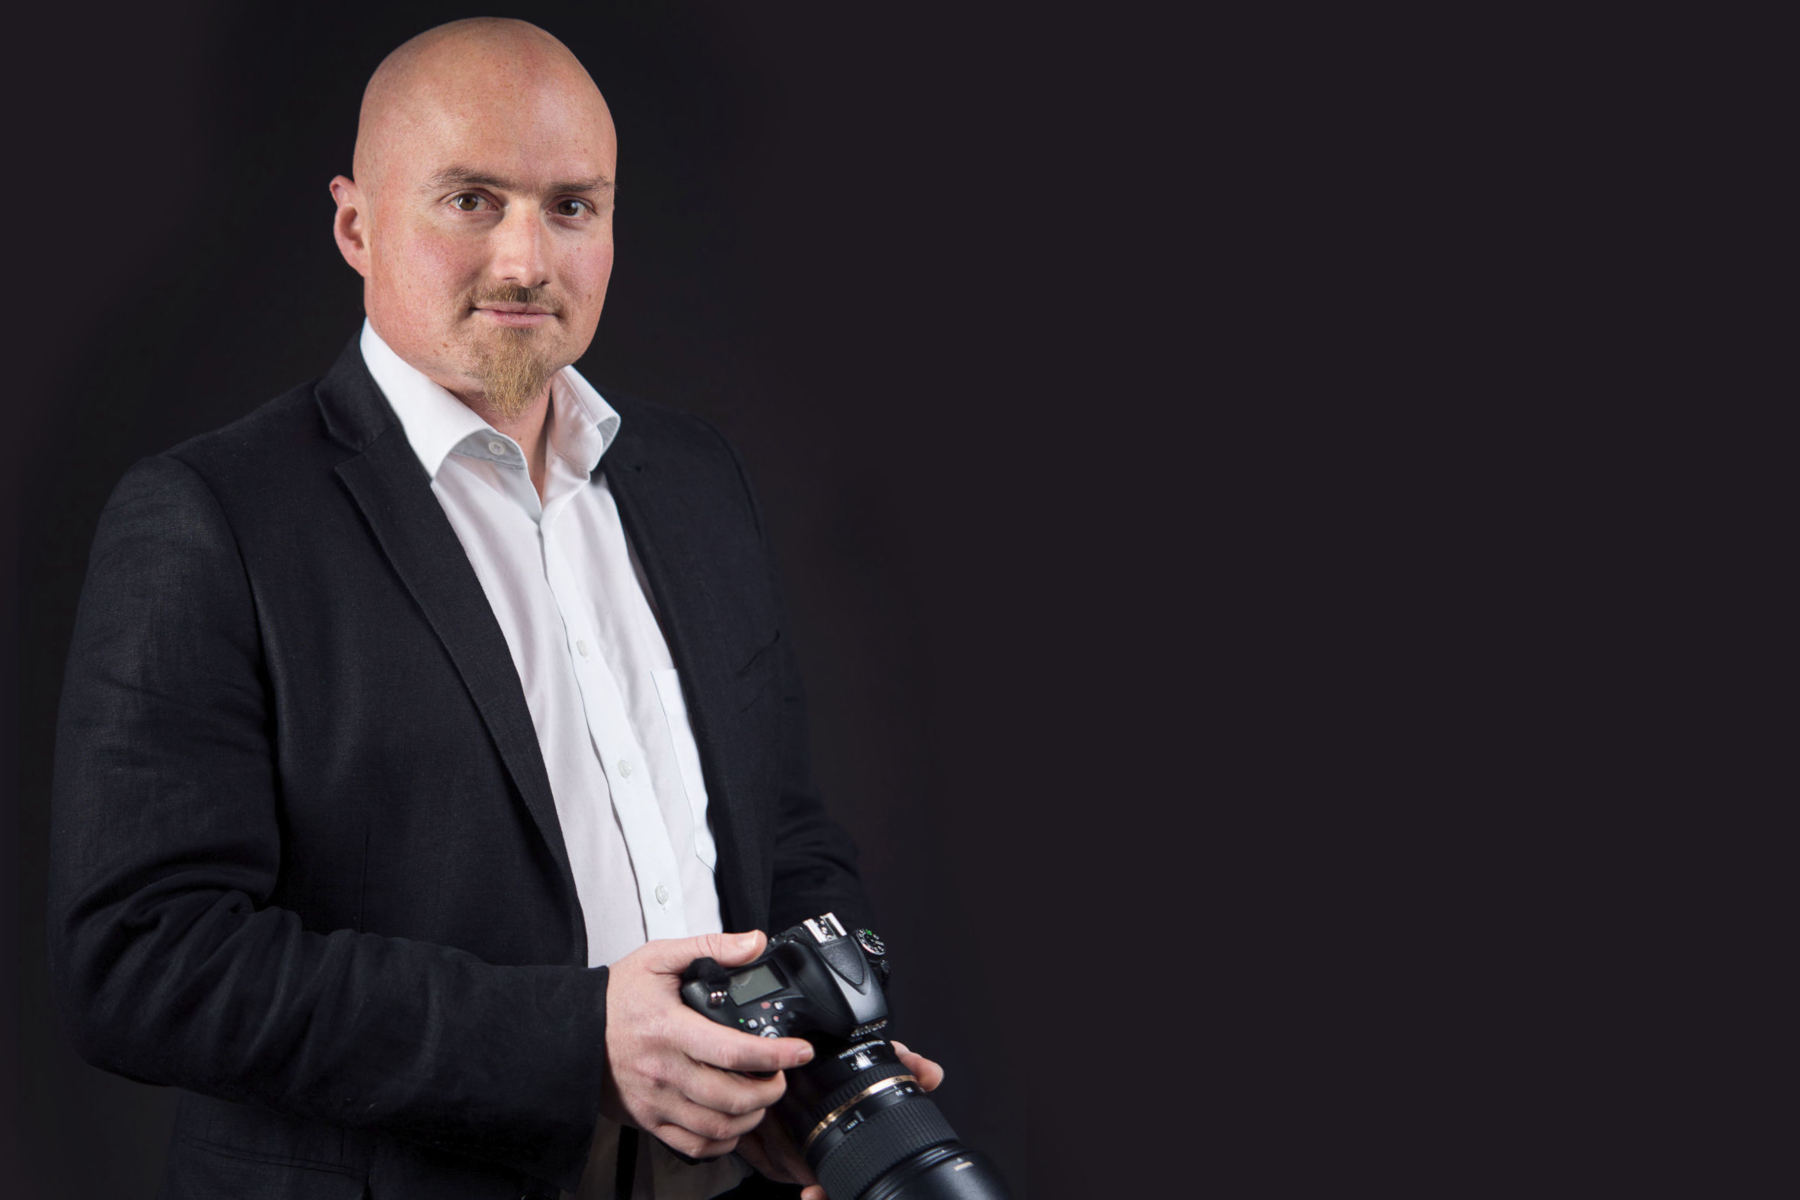 Profilbild Matthias Otto Fotograf Mottografie Businessfotograf Industriefotograf